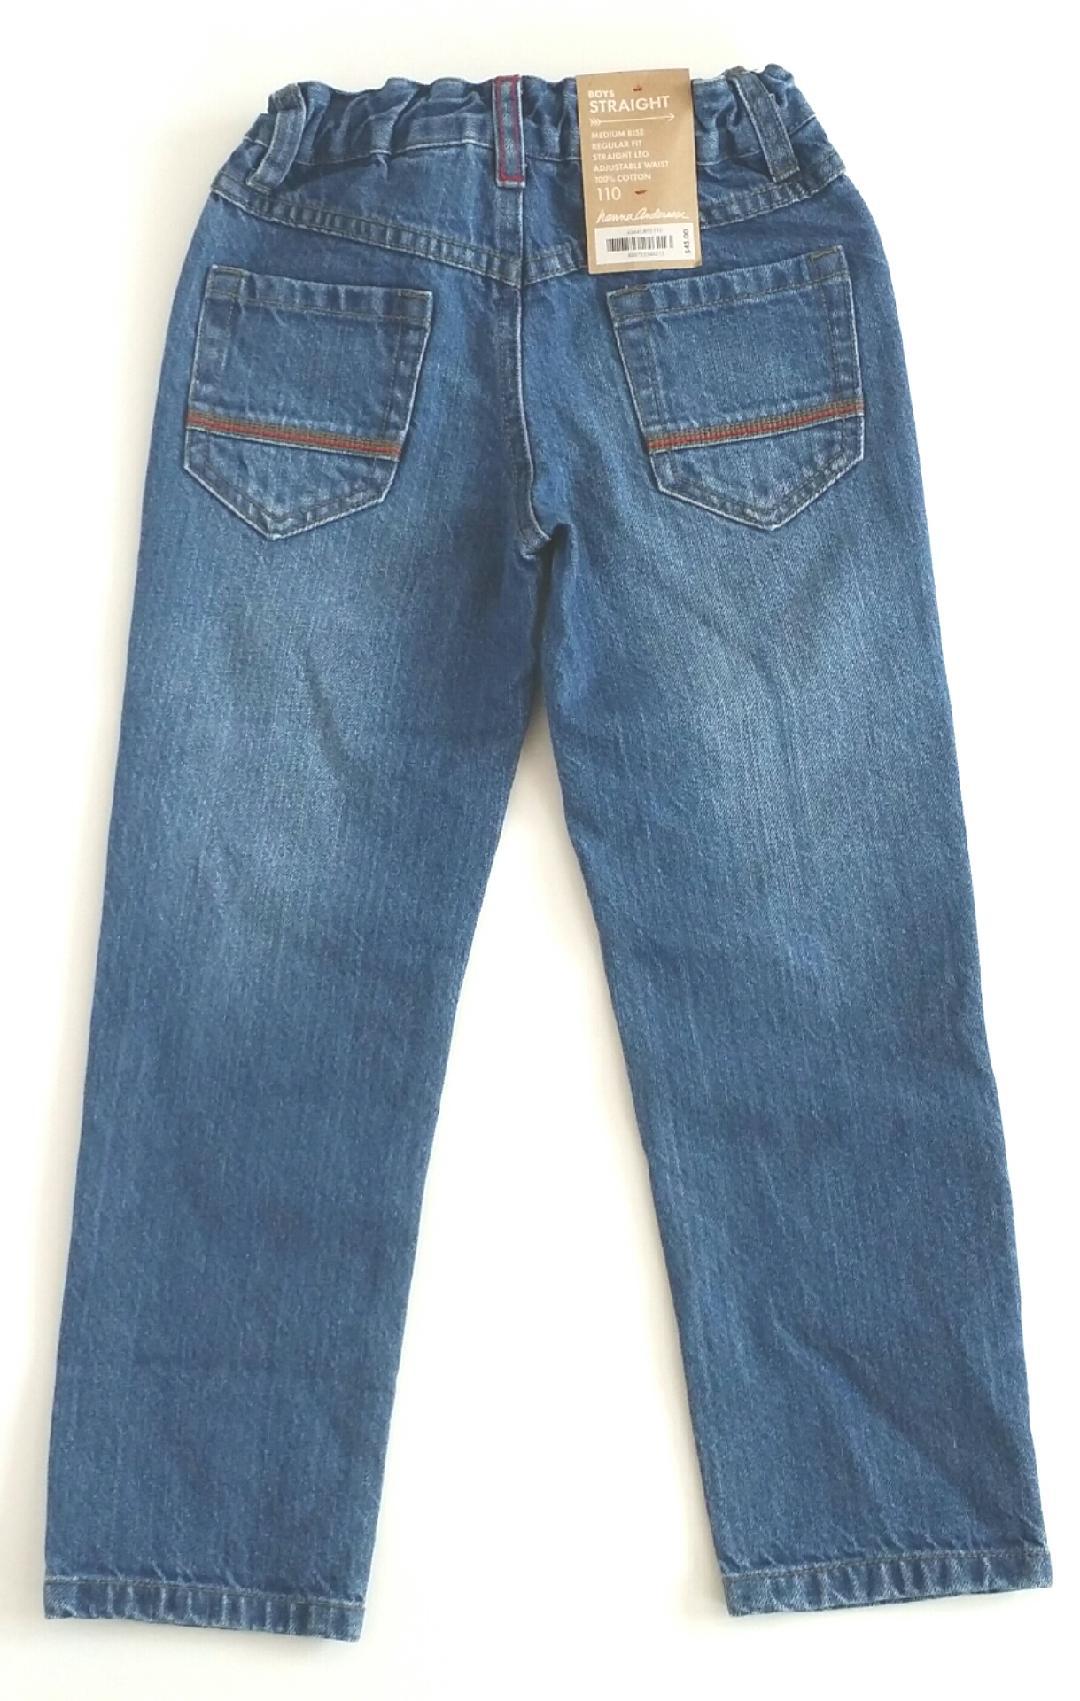 Hanna-Andersson-5-YEARS-Straight-Leg-Jeans_2157054B.jpg